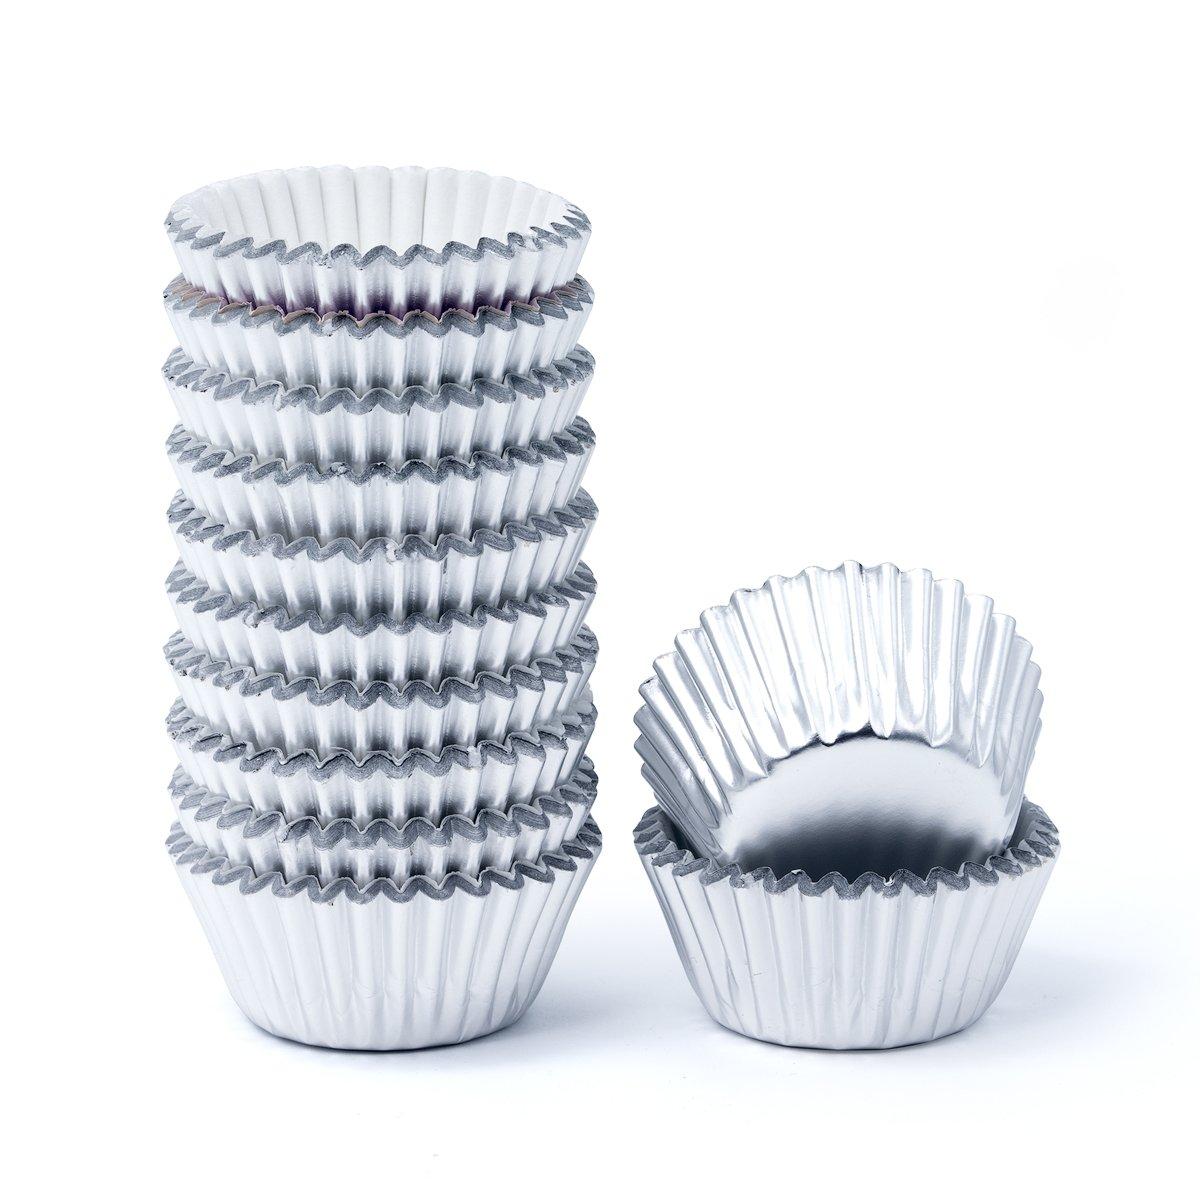 Mkustar 300 Count Foil Metallic Cupcake Liners Mini Baking Paper Cups Silver Mkustar-023